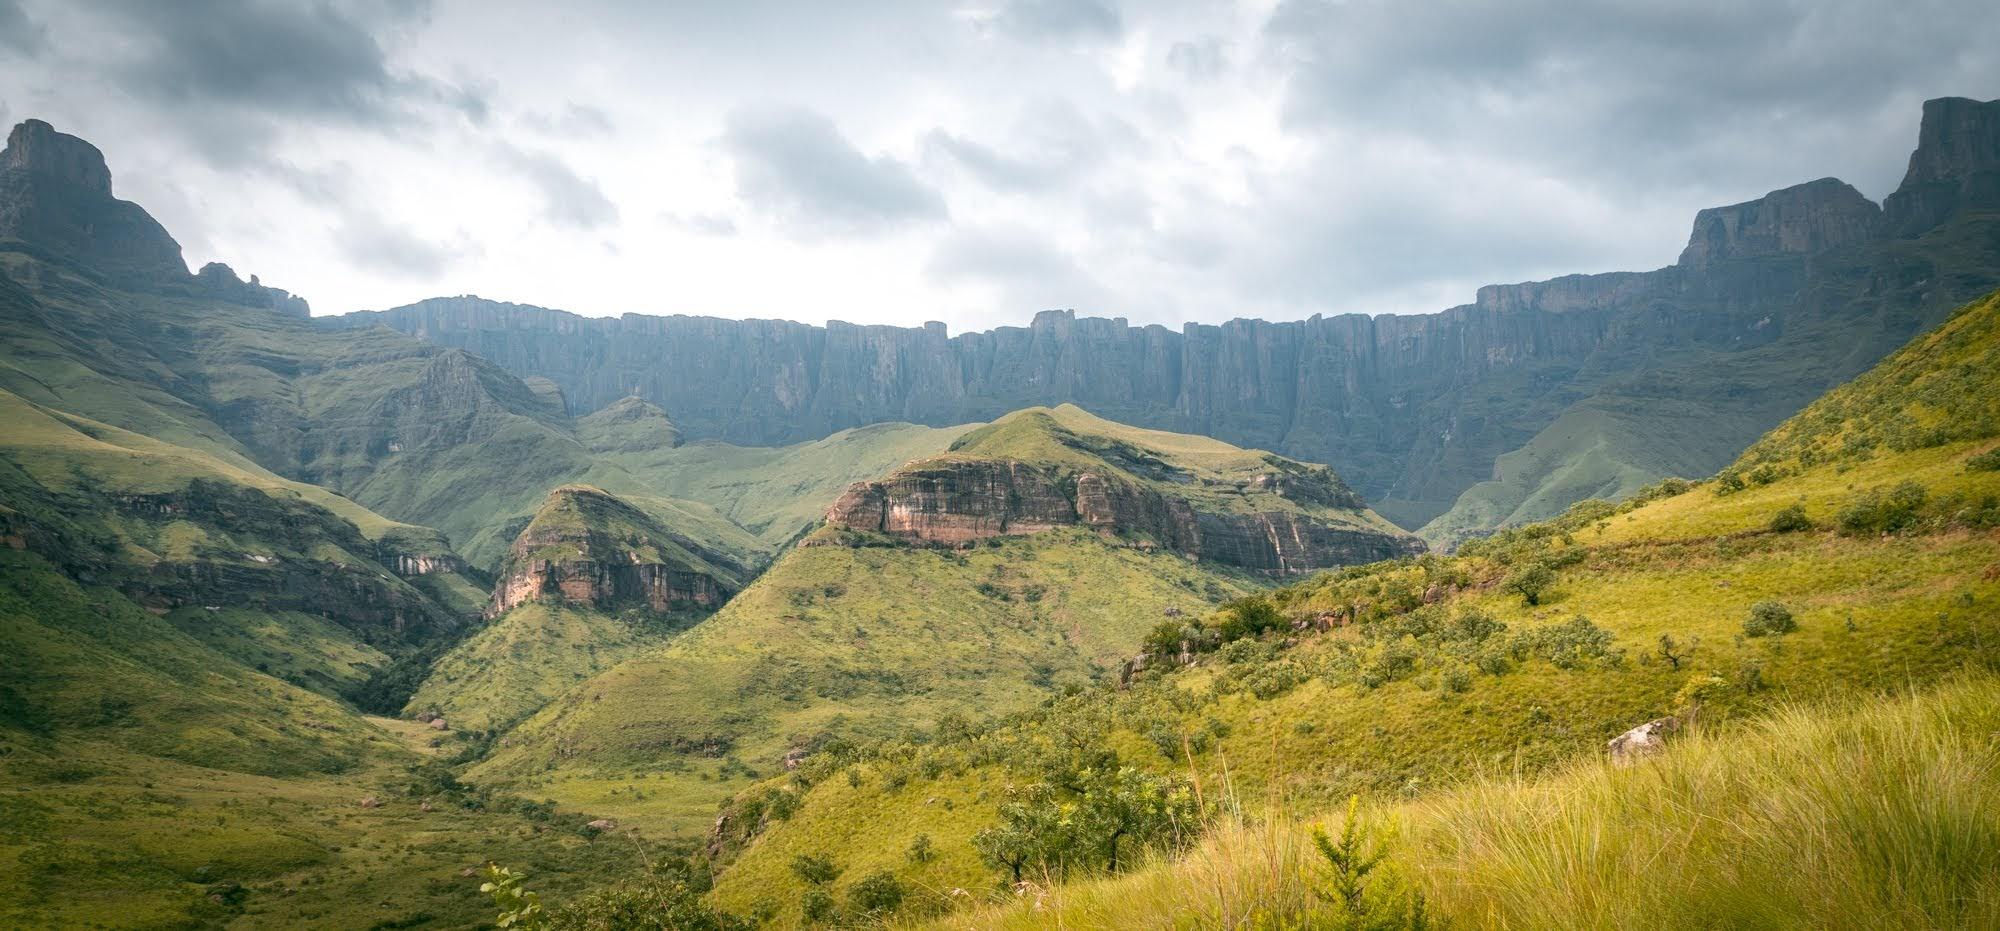 The amphitheater section of Drakensberg Mountain range